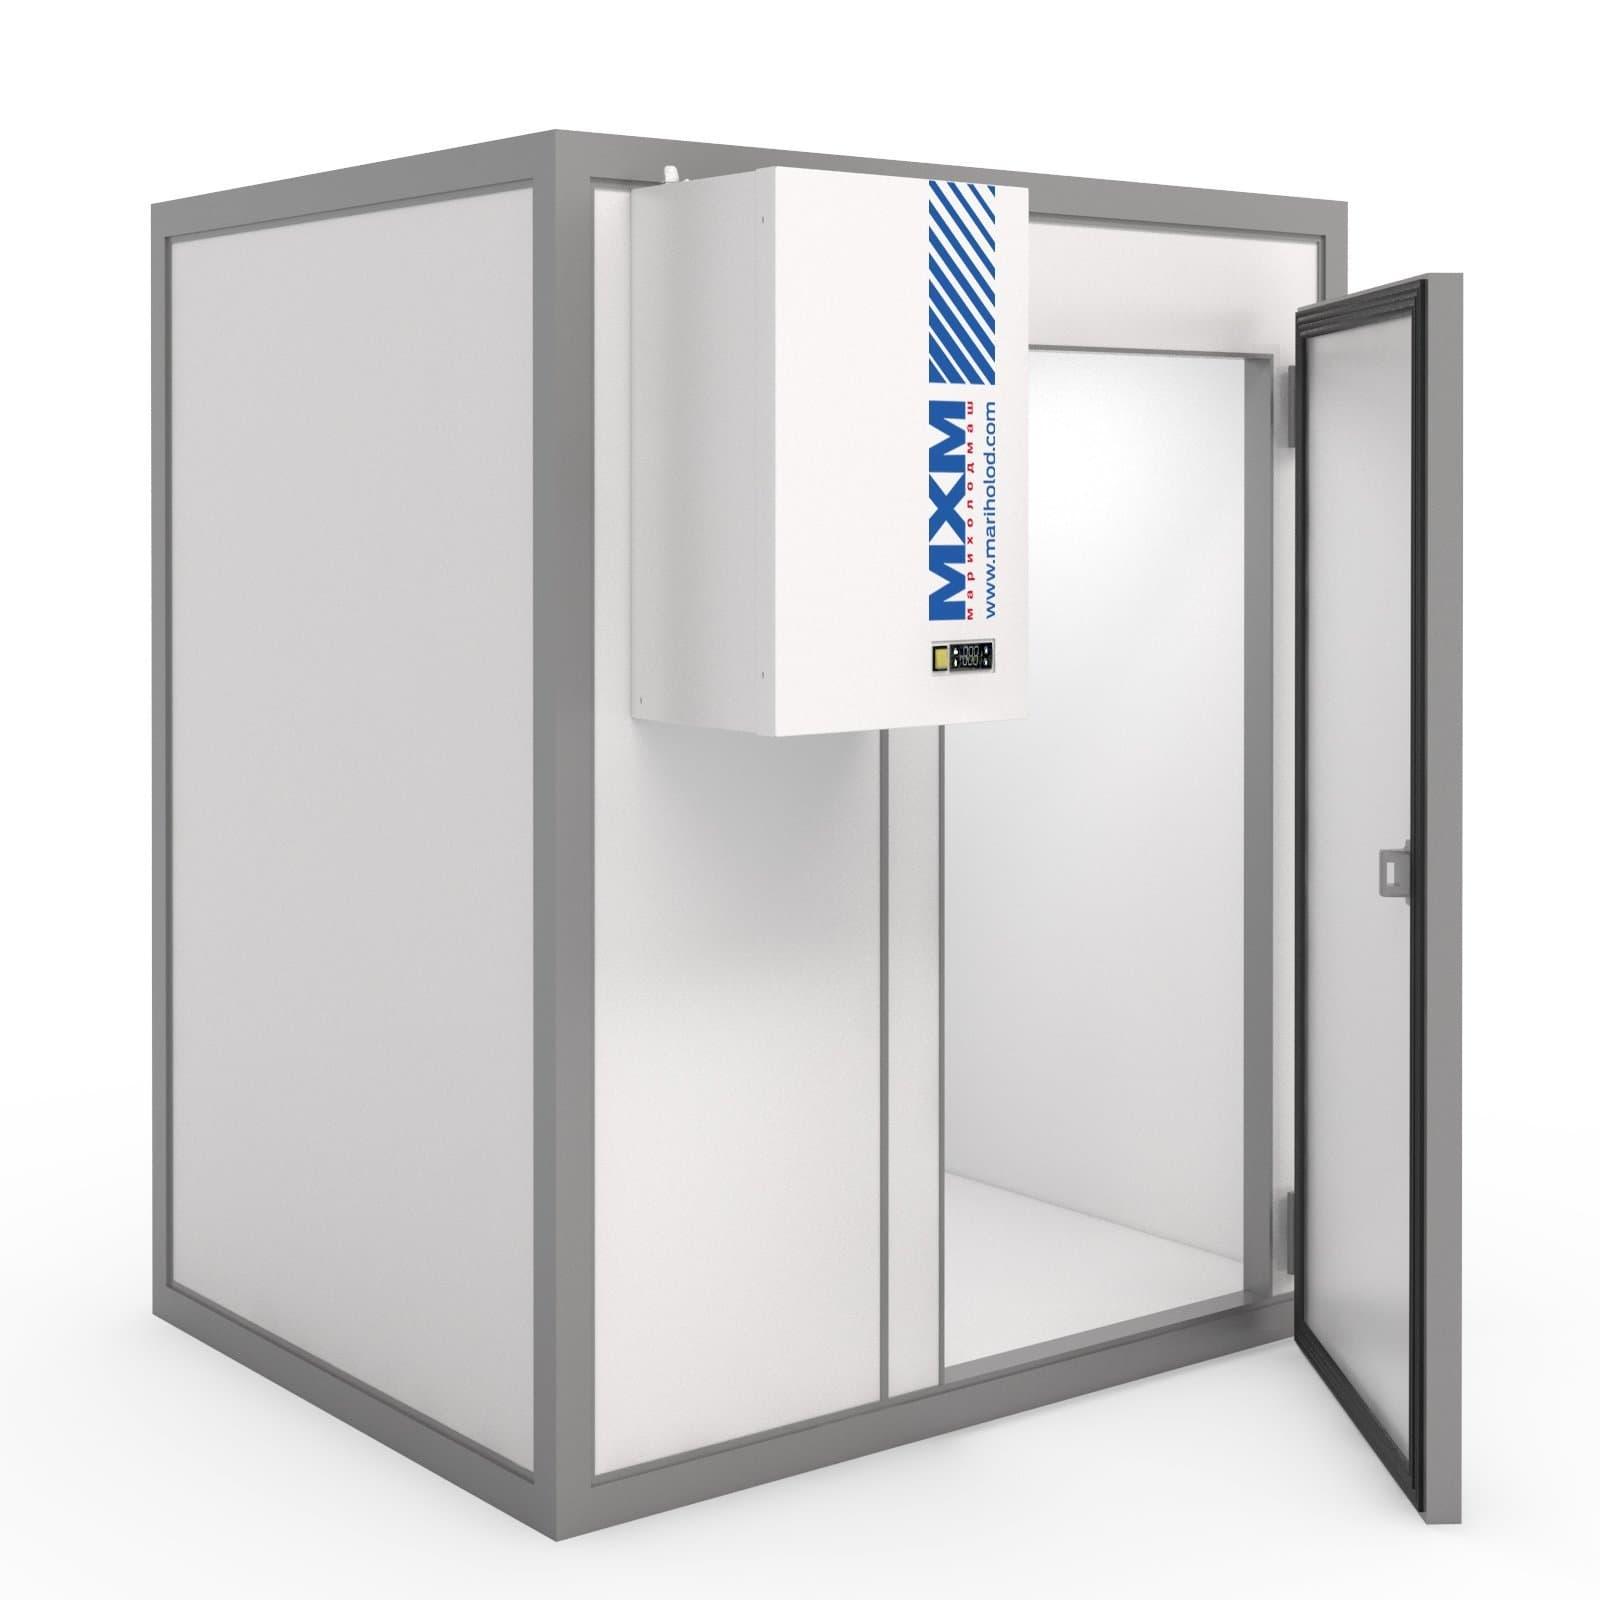 Камера холодильная КХН-99,53 (2560×16360×2720 мм)